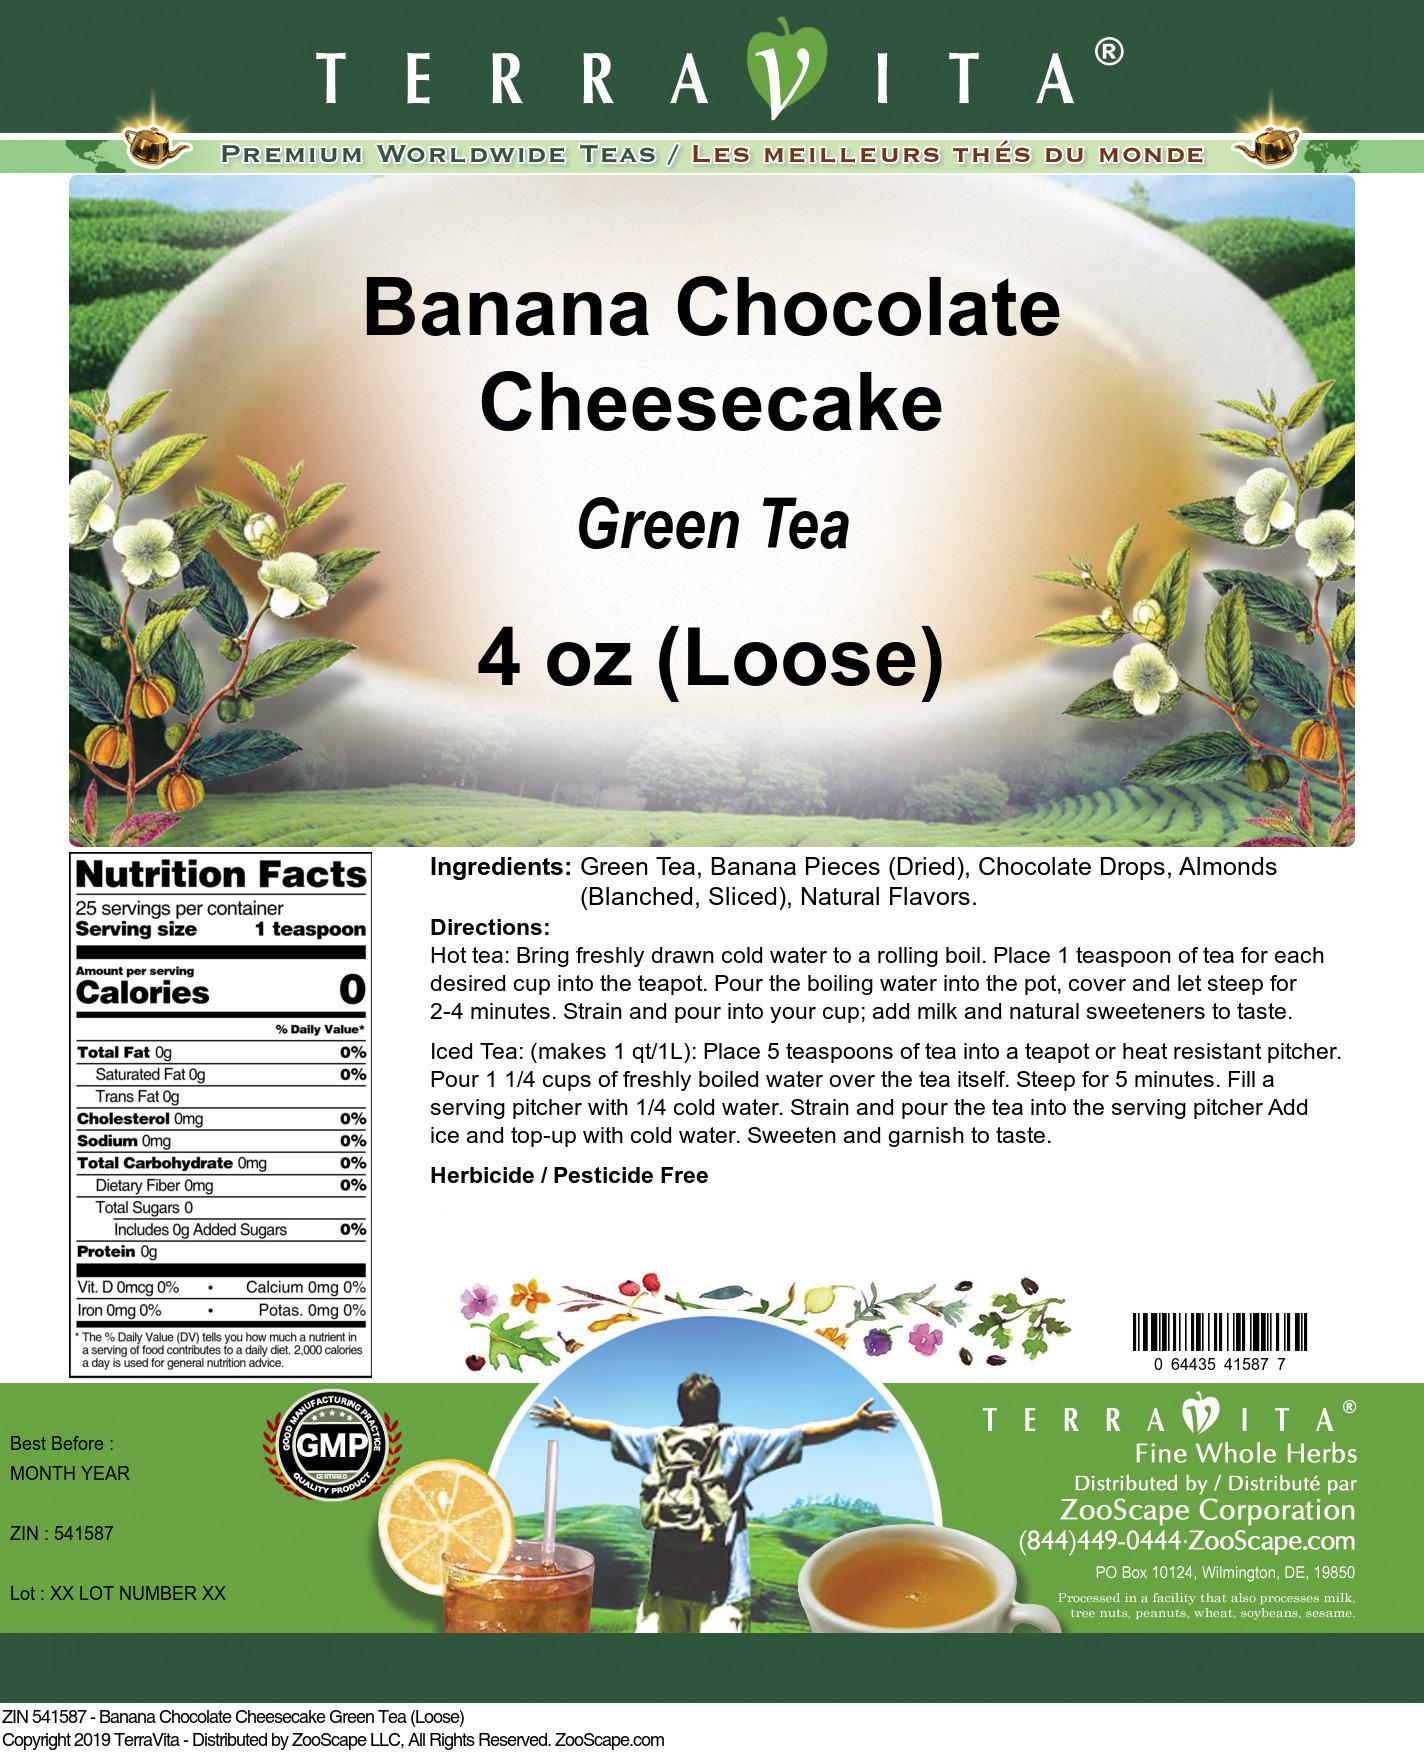 Banana Chocolate Cheesecake Green Tea (Loose)